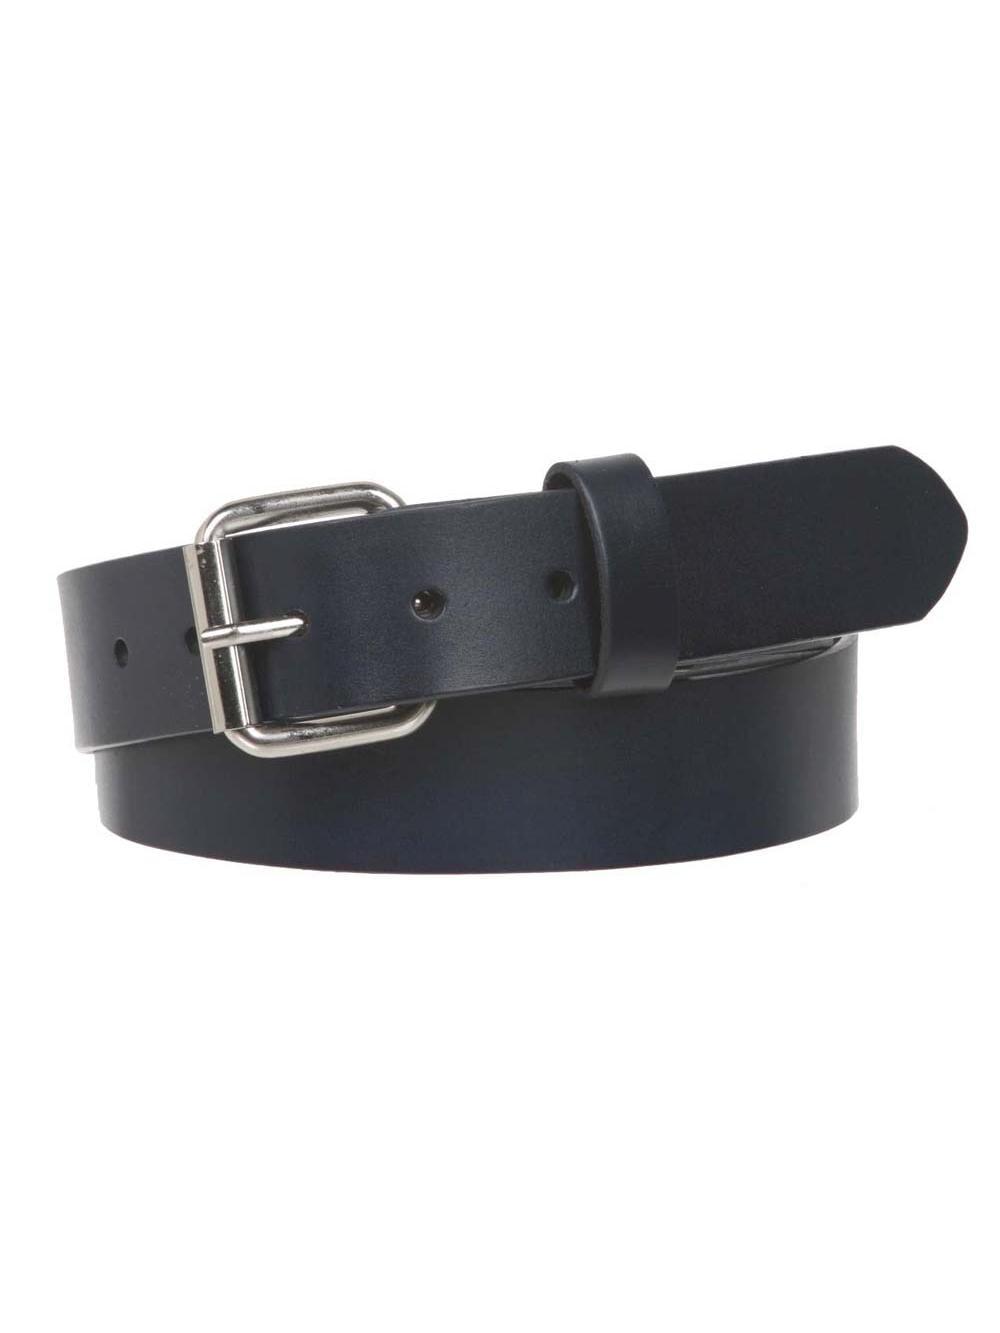 34 mm Beltiscool Snap On Standard Plain Full Grain Leather Belt